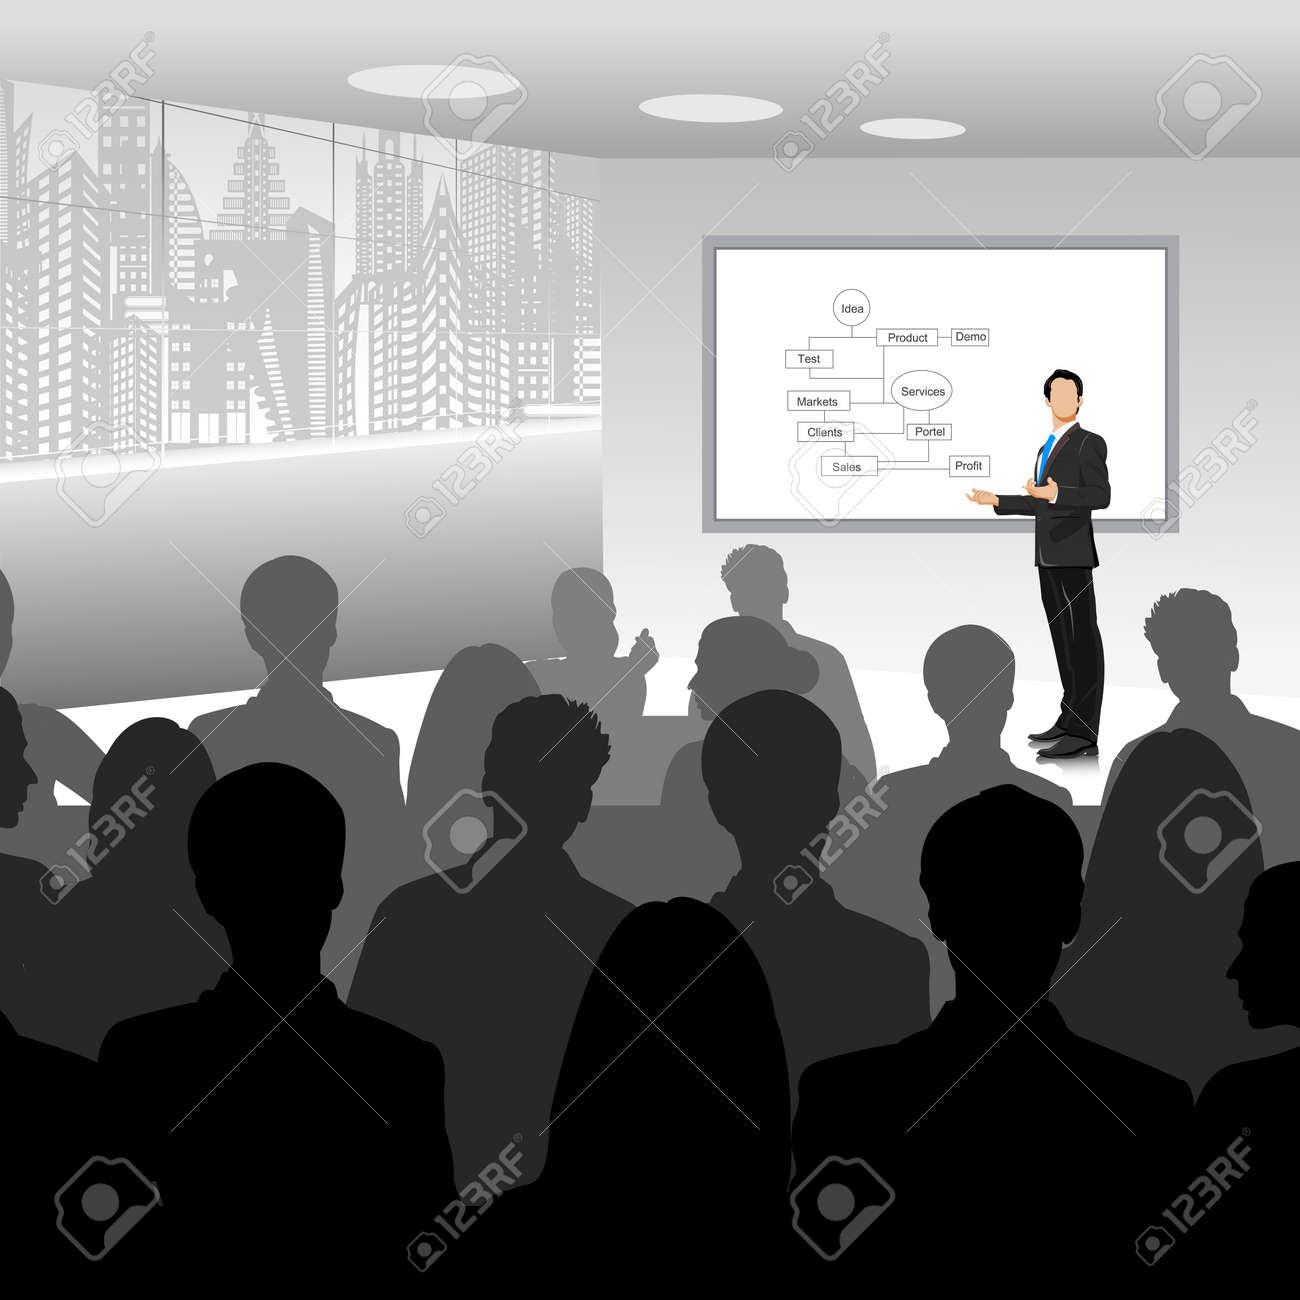 easy to edit vector illustration of businessman giving presentation Stock Vector - 26266188